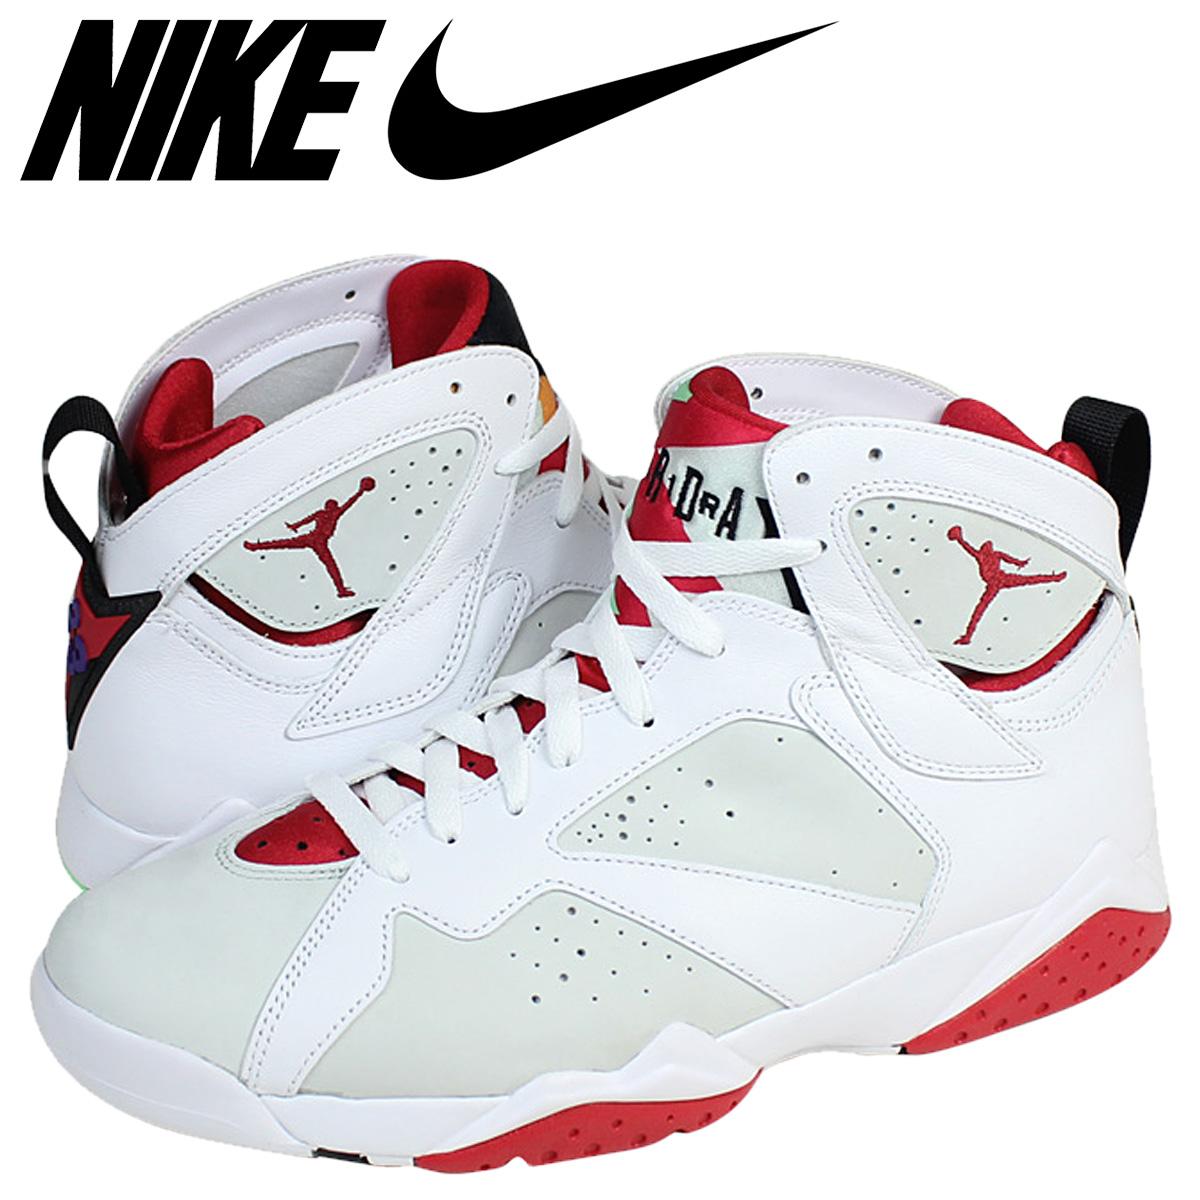 outlet store 4feb6 a93b0 Nike NIKE Air Jordan sneakers AIR JORDAN 7 RETRO HAREL Air Jordan 7  nostalgic 304,775-125 white men